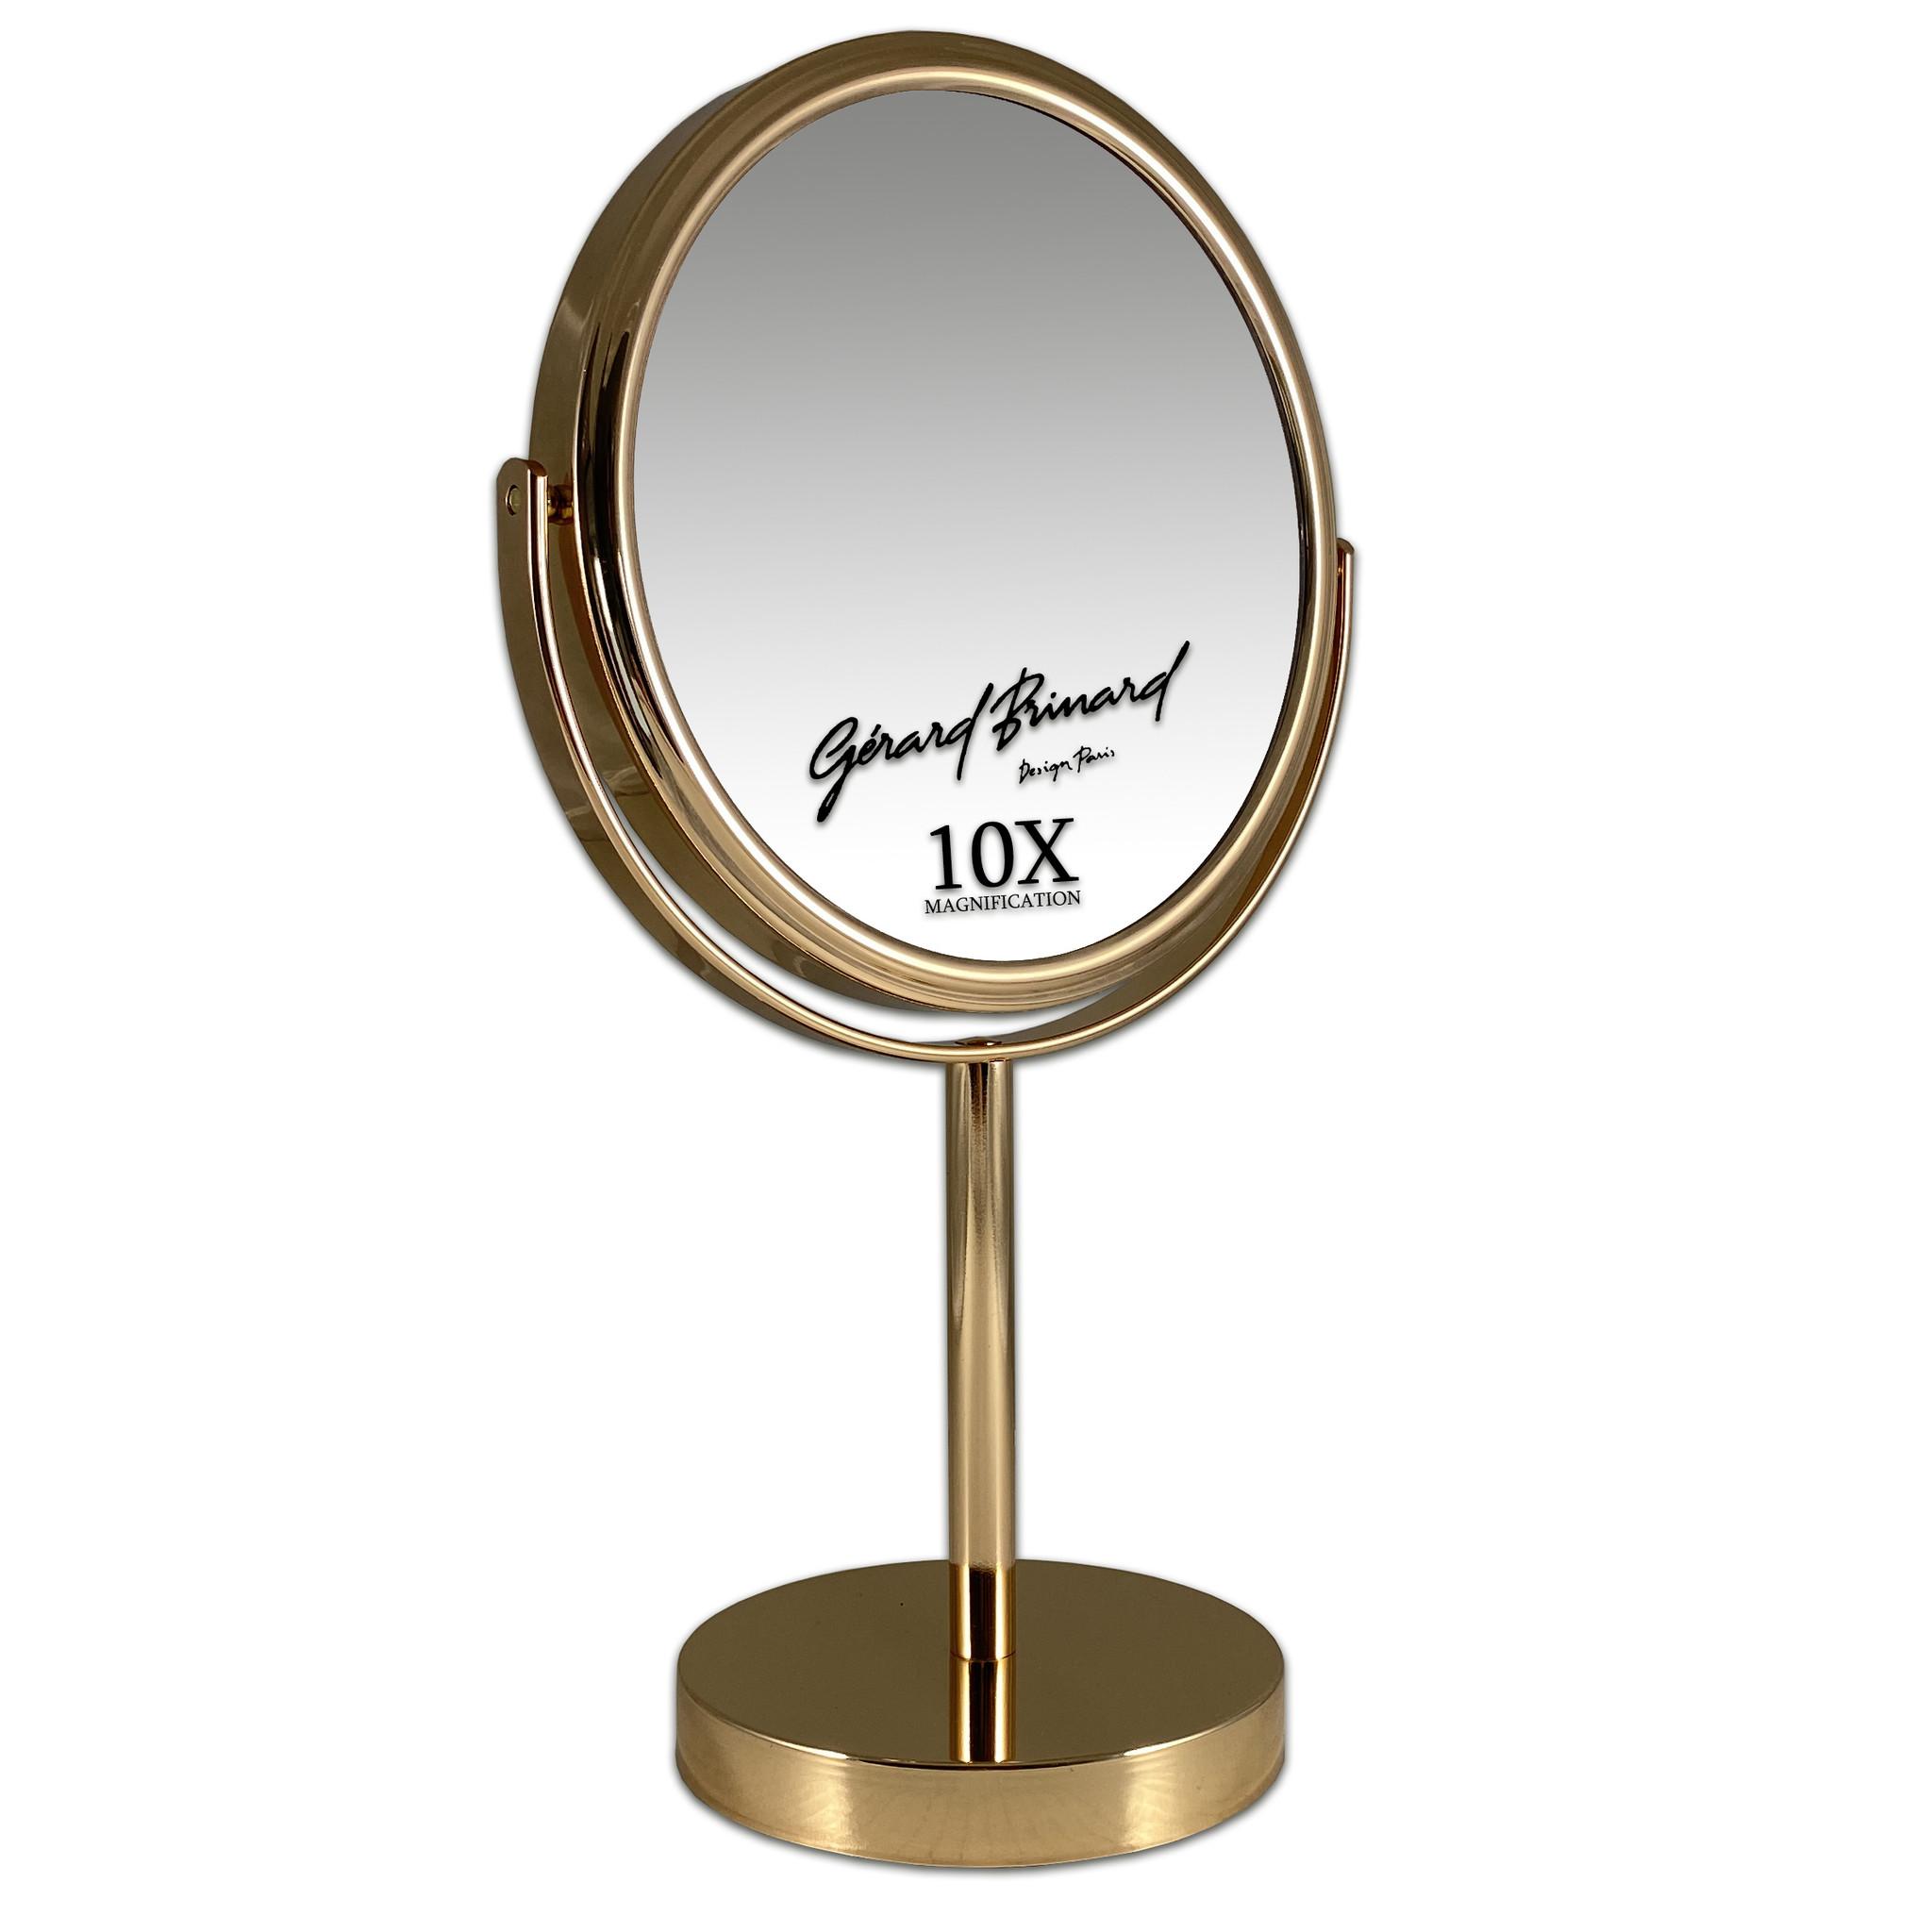 Gérard Brinard Metalen make-up spiegel goud- 10x vergroting 18cmØ